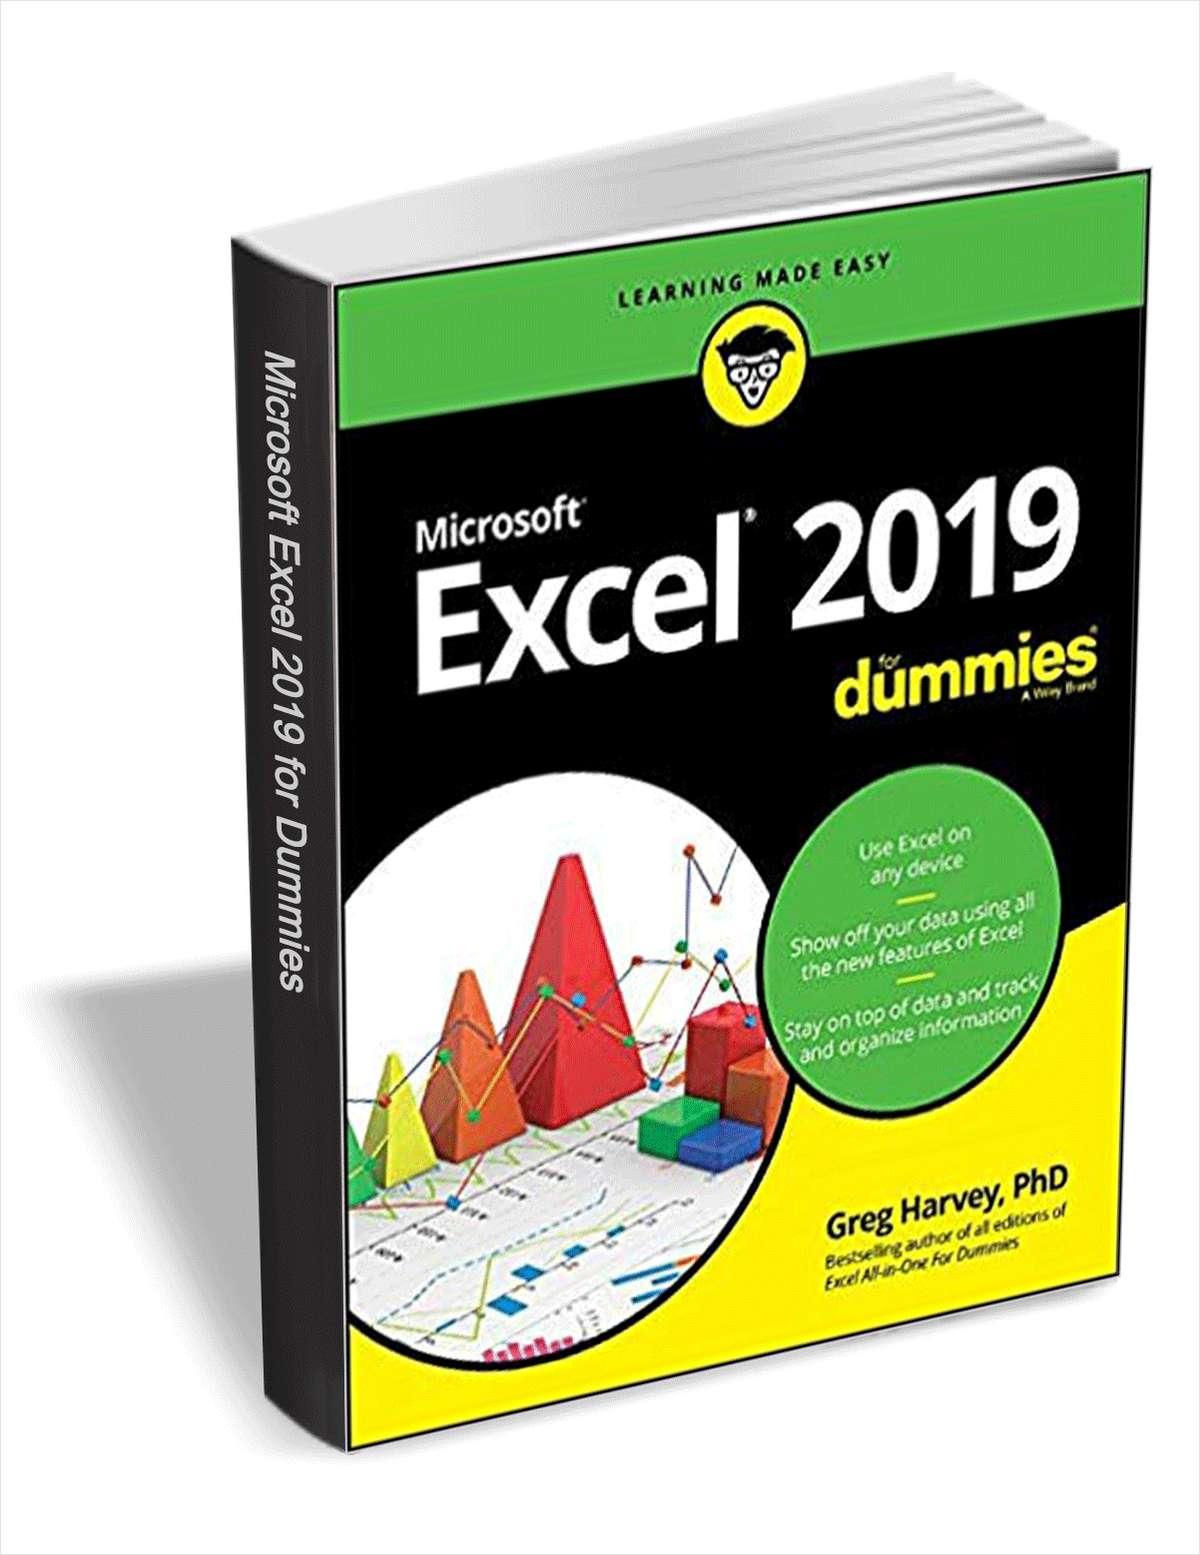 Excel 2019 for Dummies (eBook) kostenlos